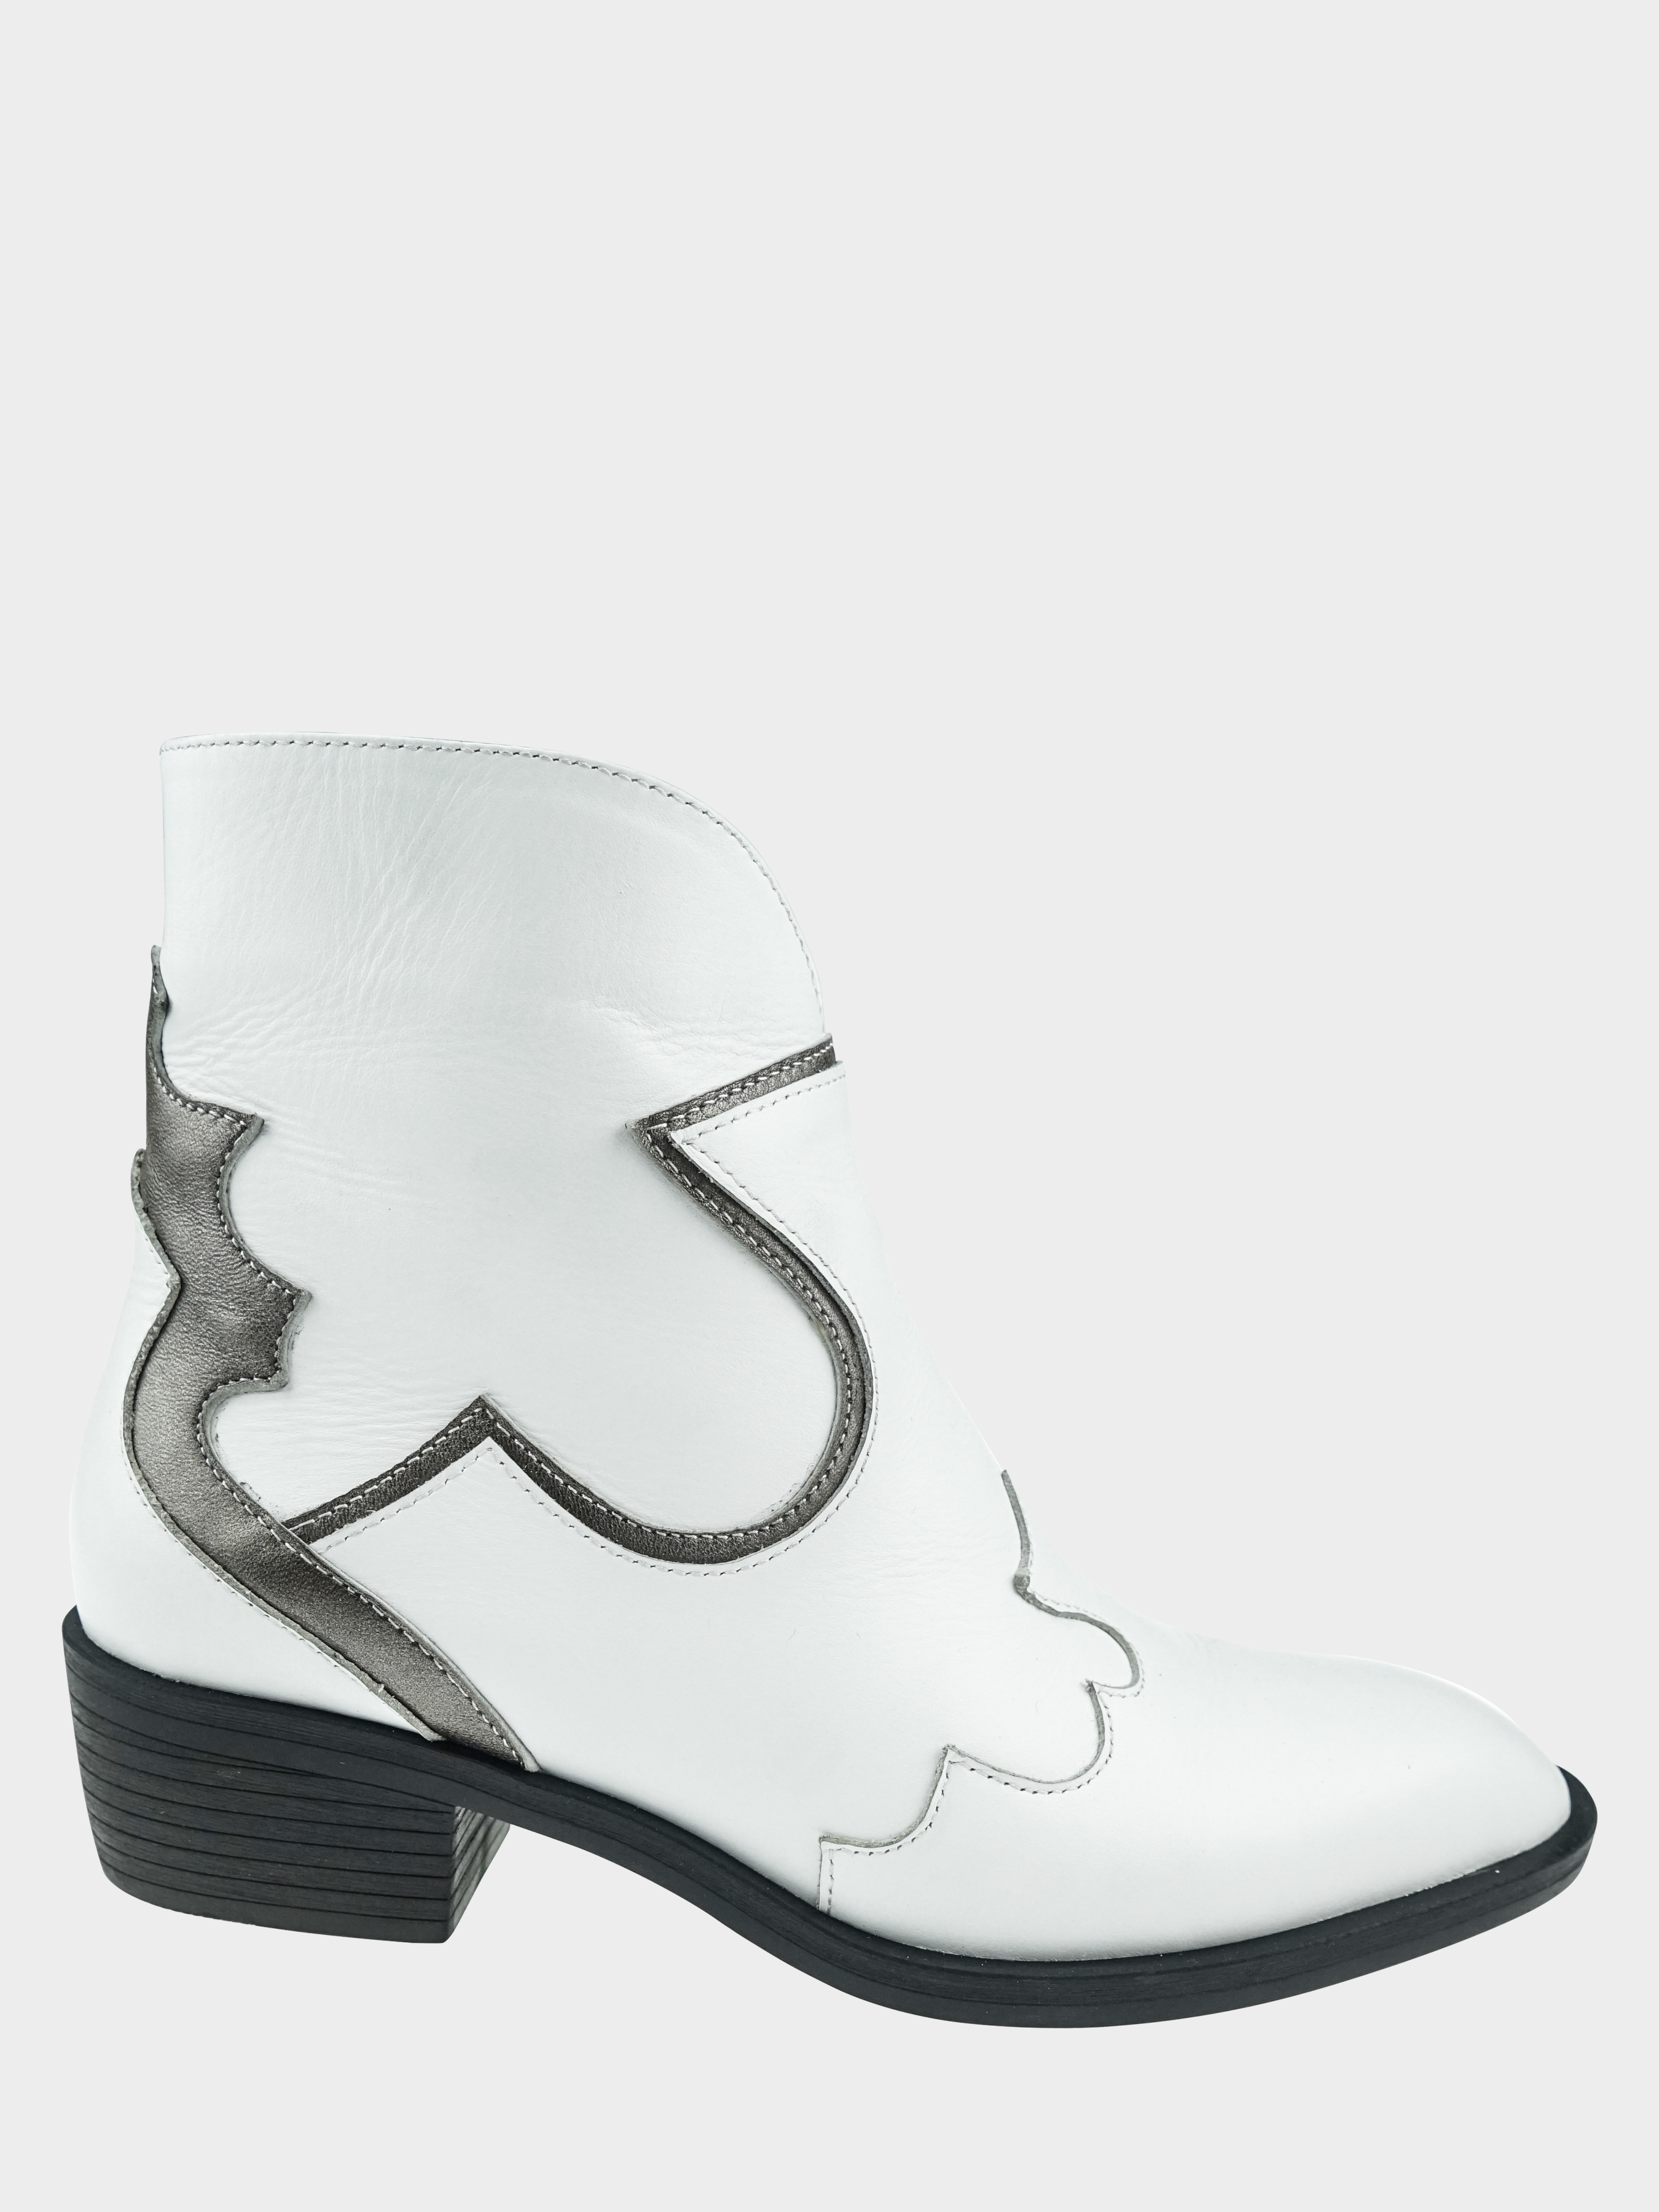 Ботинки для женщин Казаки Lo1524-00 кож подклад Lo1524-00kp размерная сетка обуви, 2017